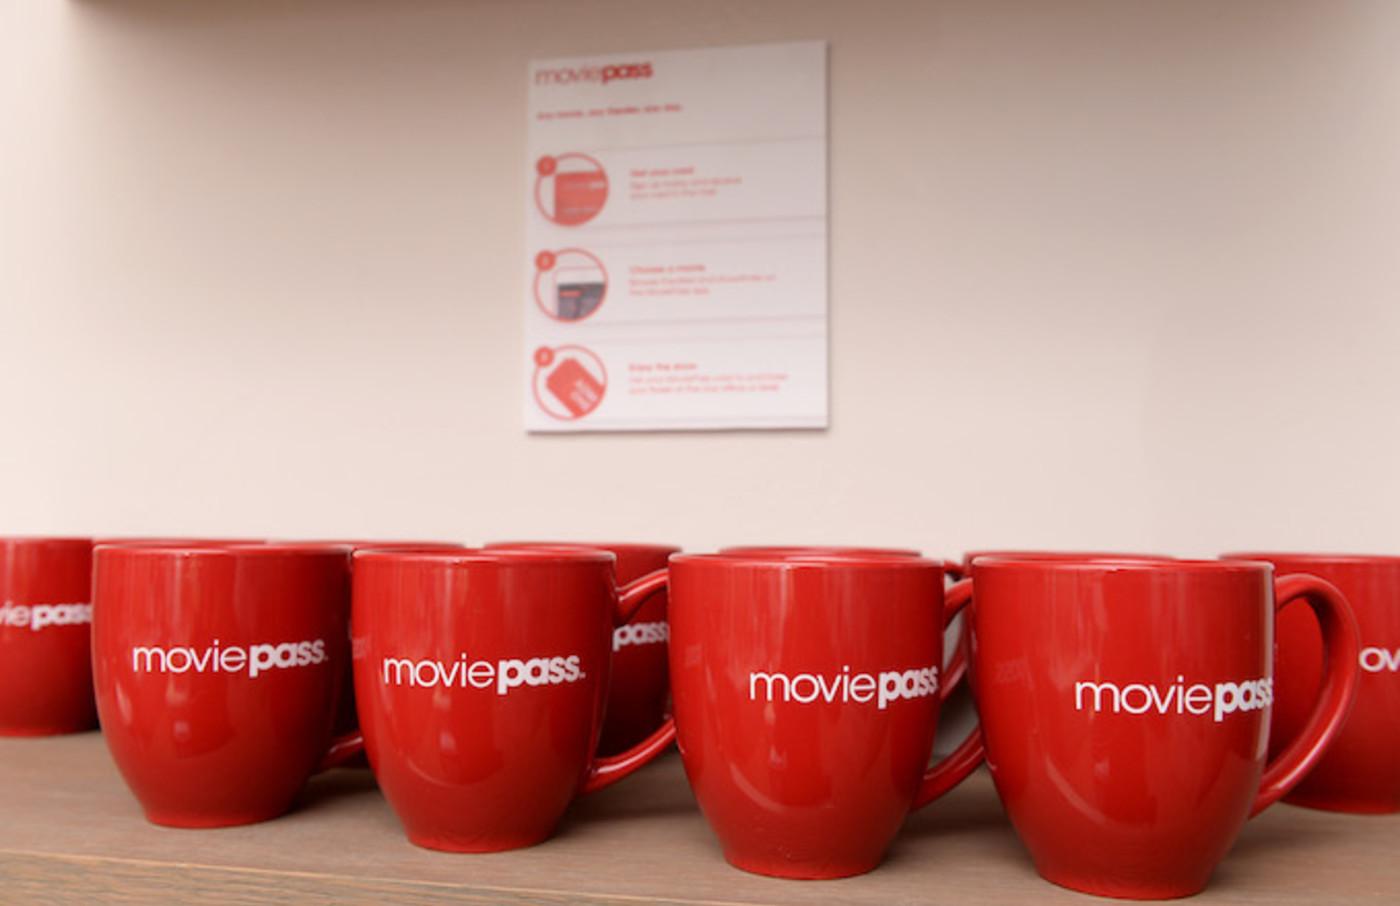 MoviePass mugs.